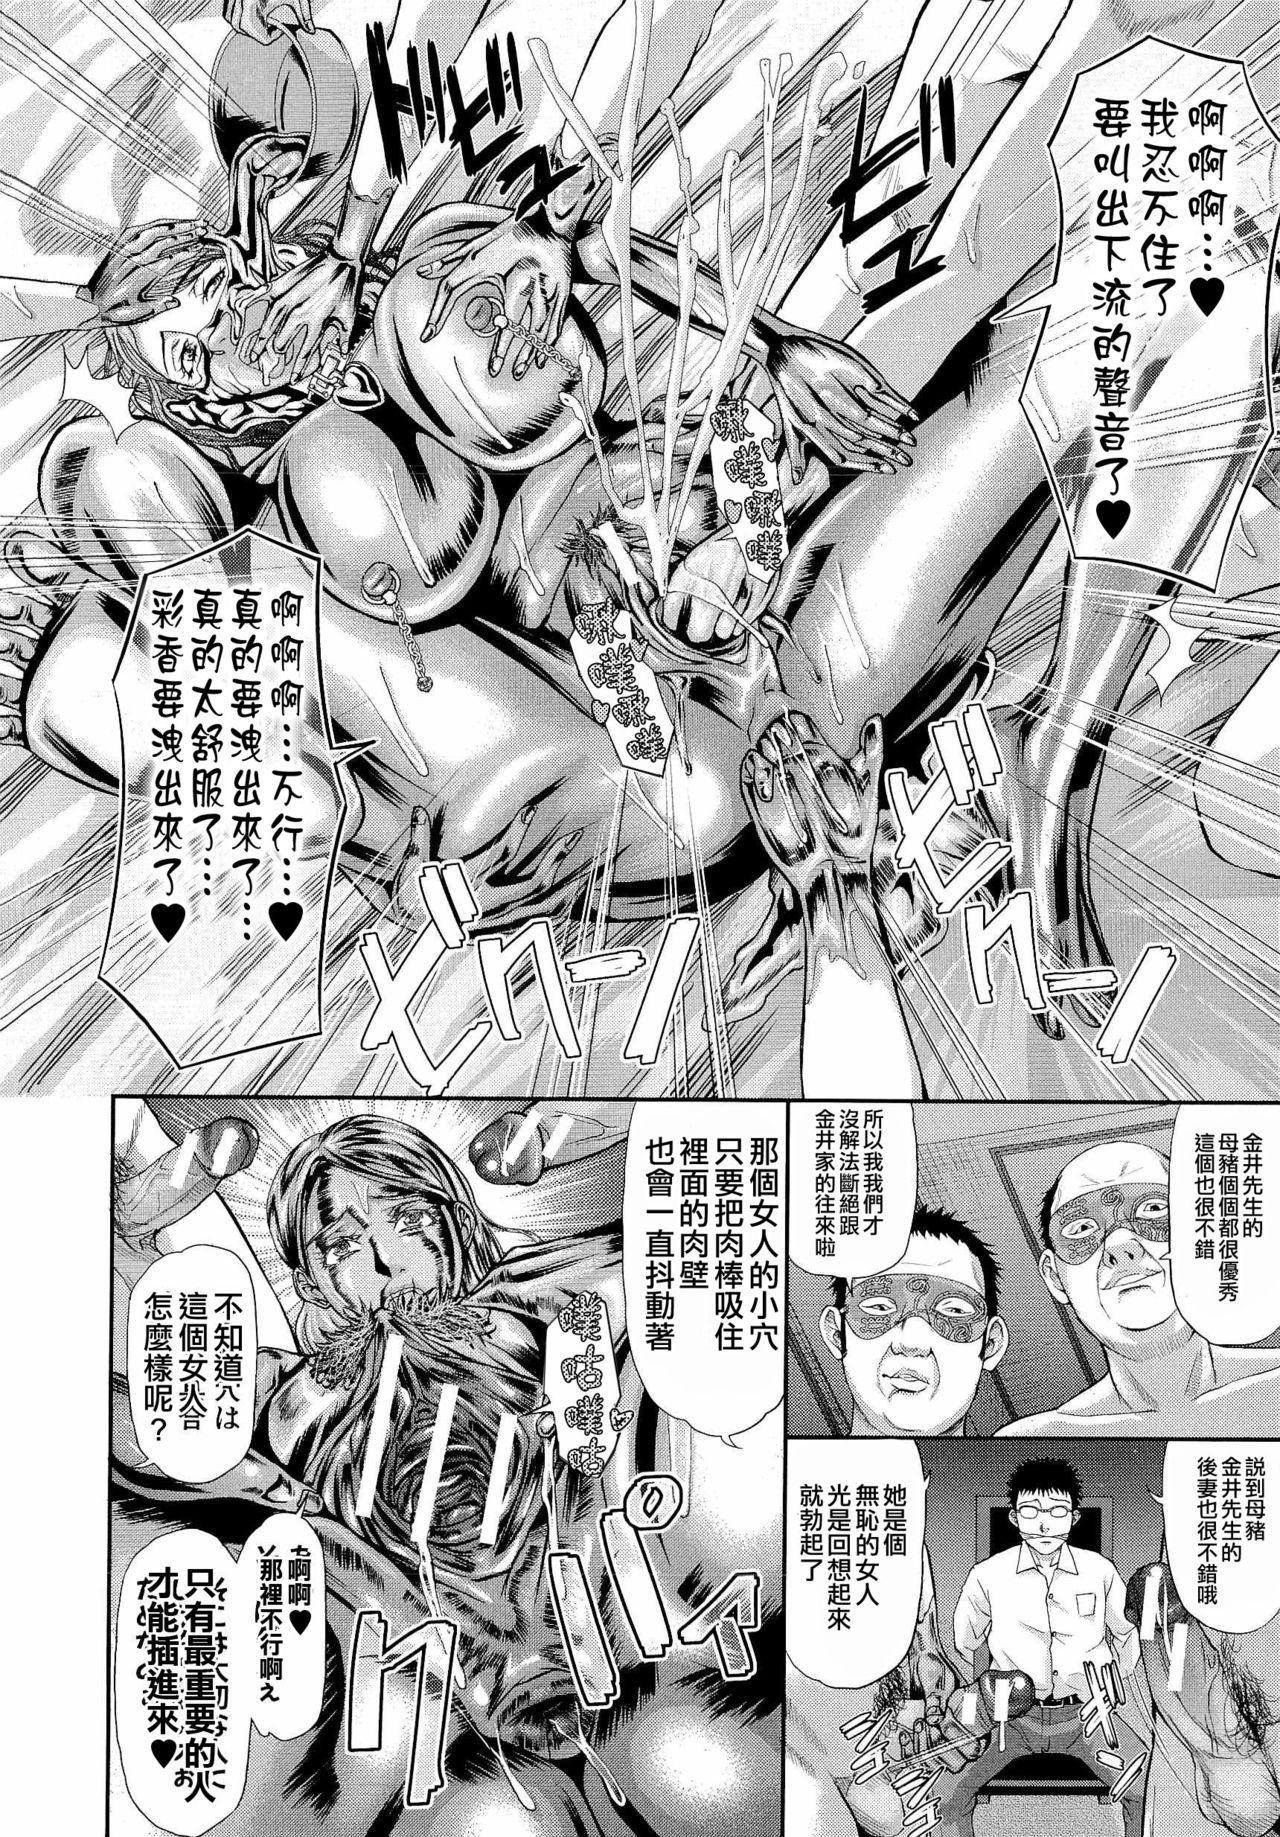 [Honebuto Danshaku] Innou Kaizou Program ~Oyako Zecchou Cult Ochi~ [Chinese]【不想记名重嵌--高质量图源】 128